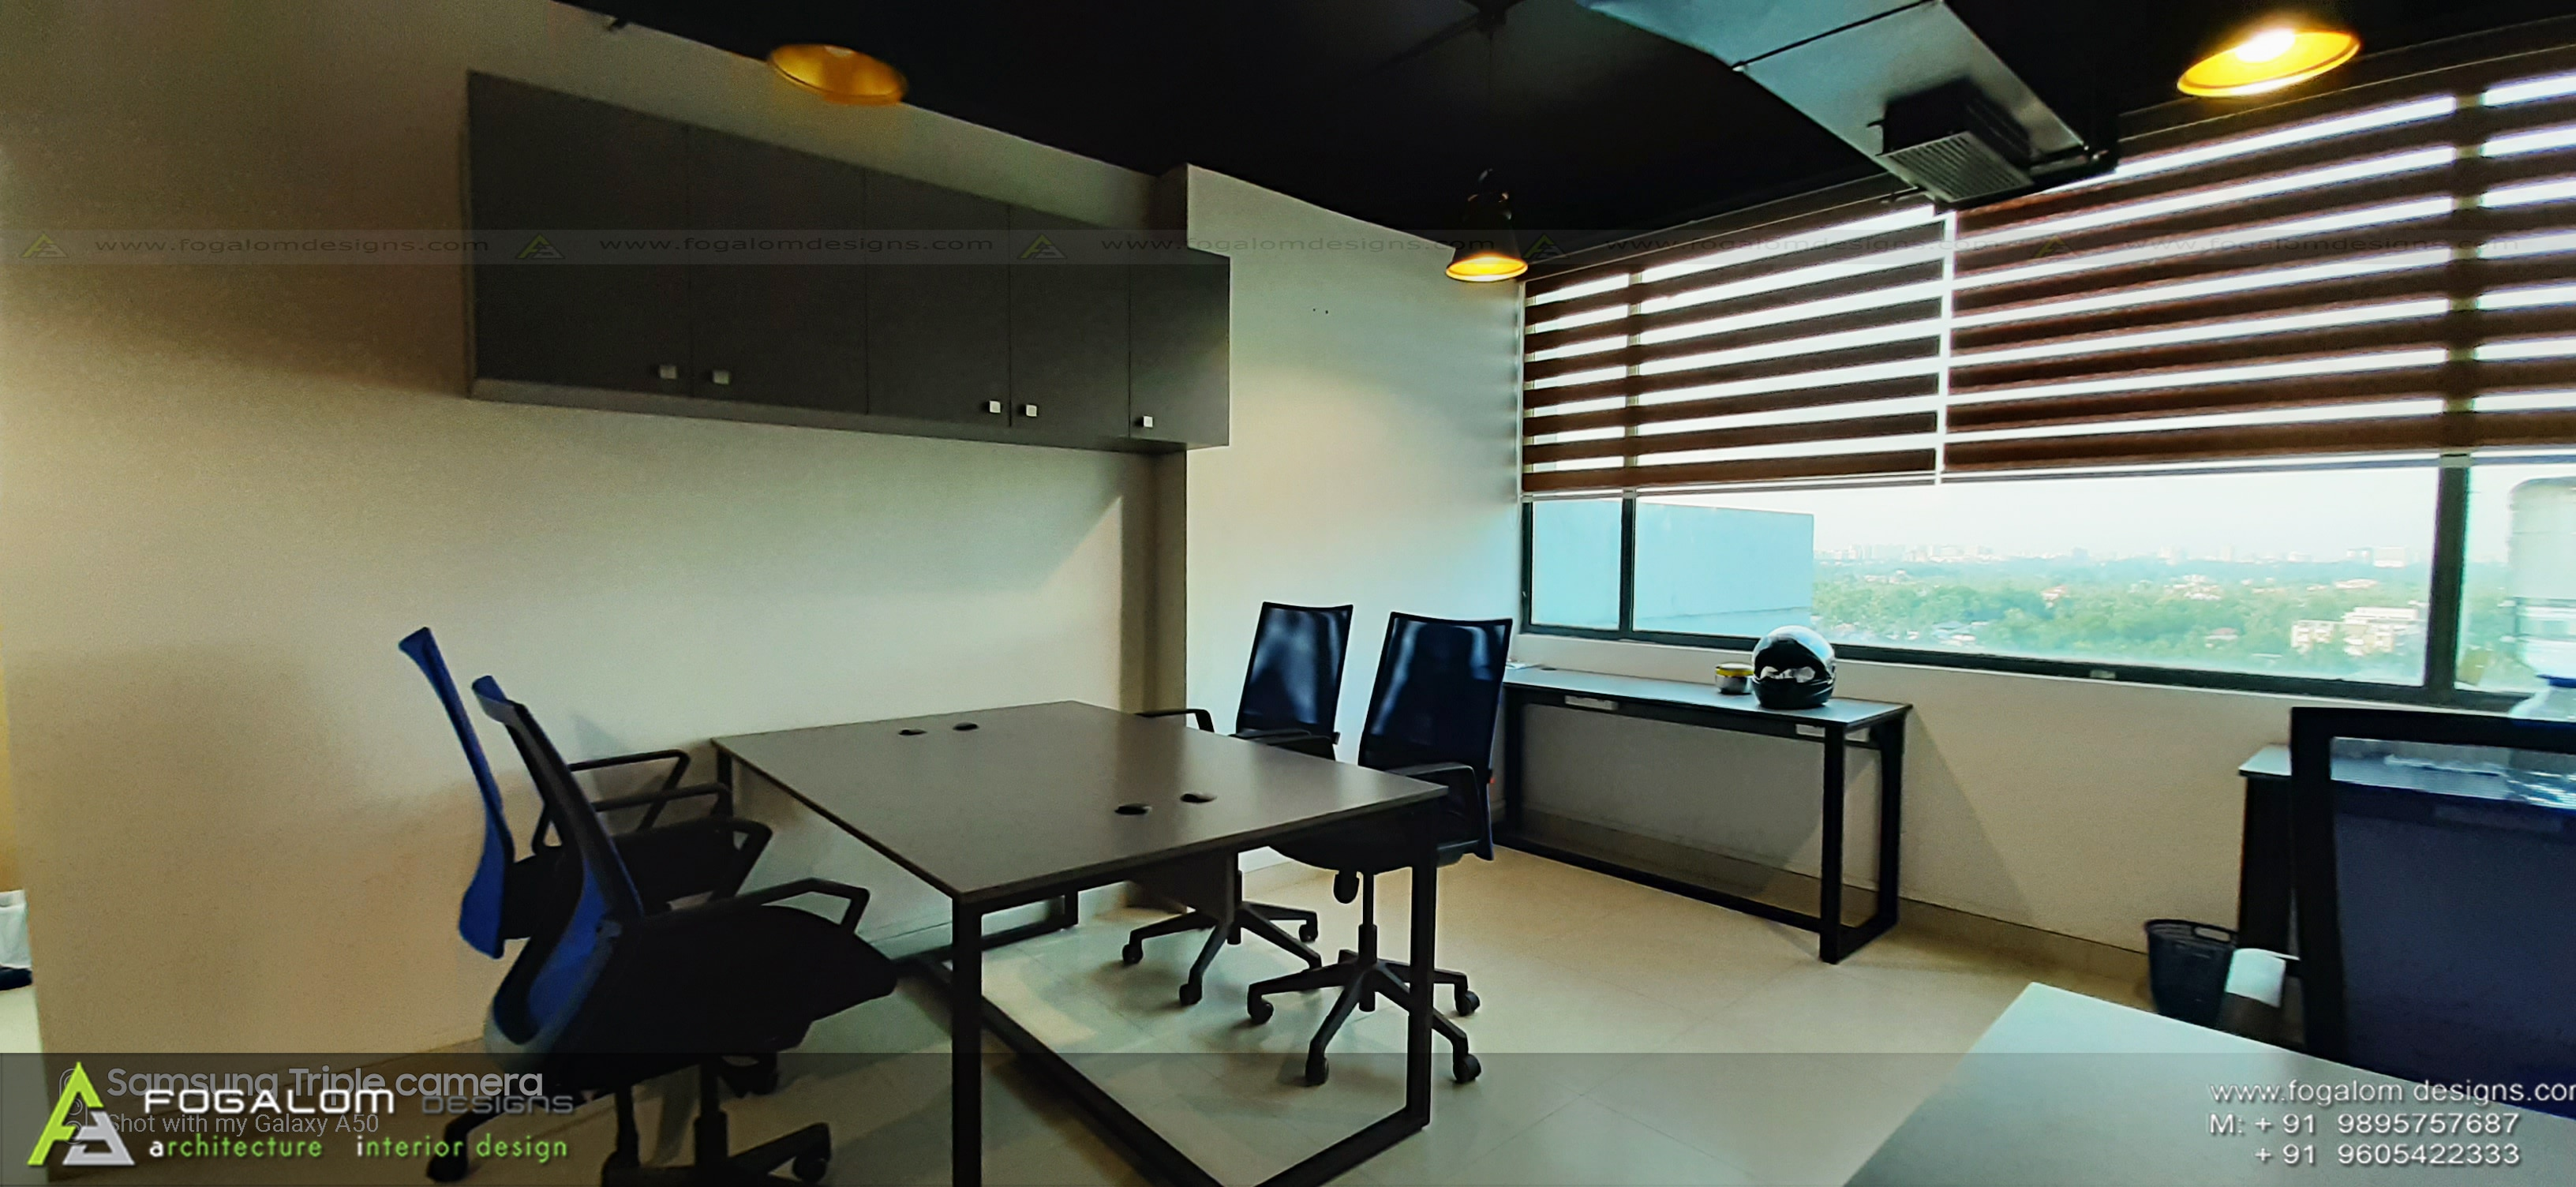 Best Interior Designers In Kochi Office Int Fogalom Designs